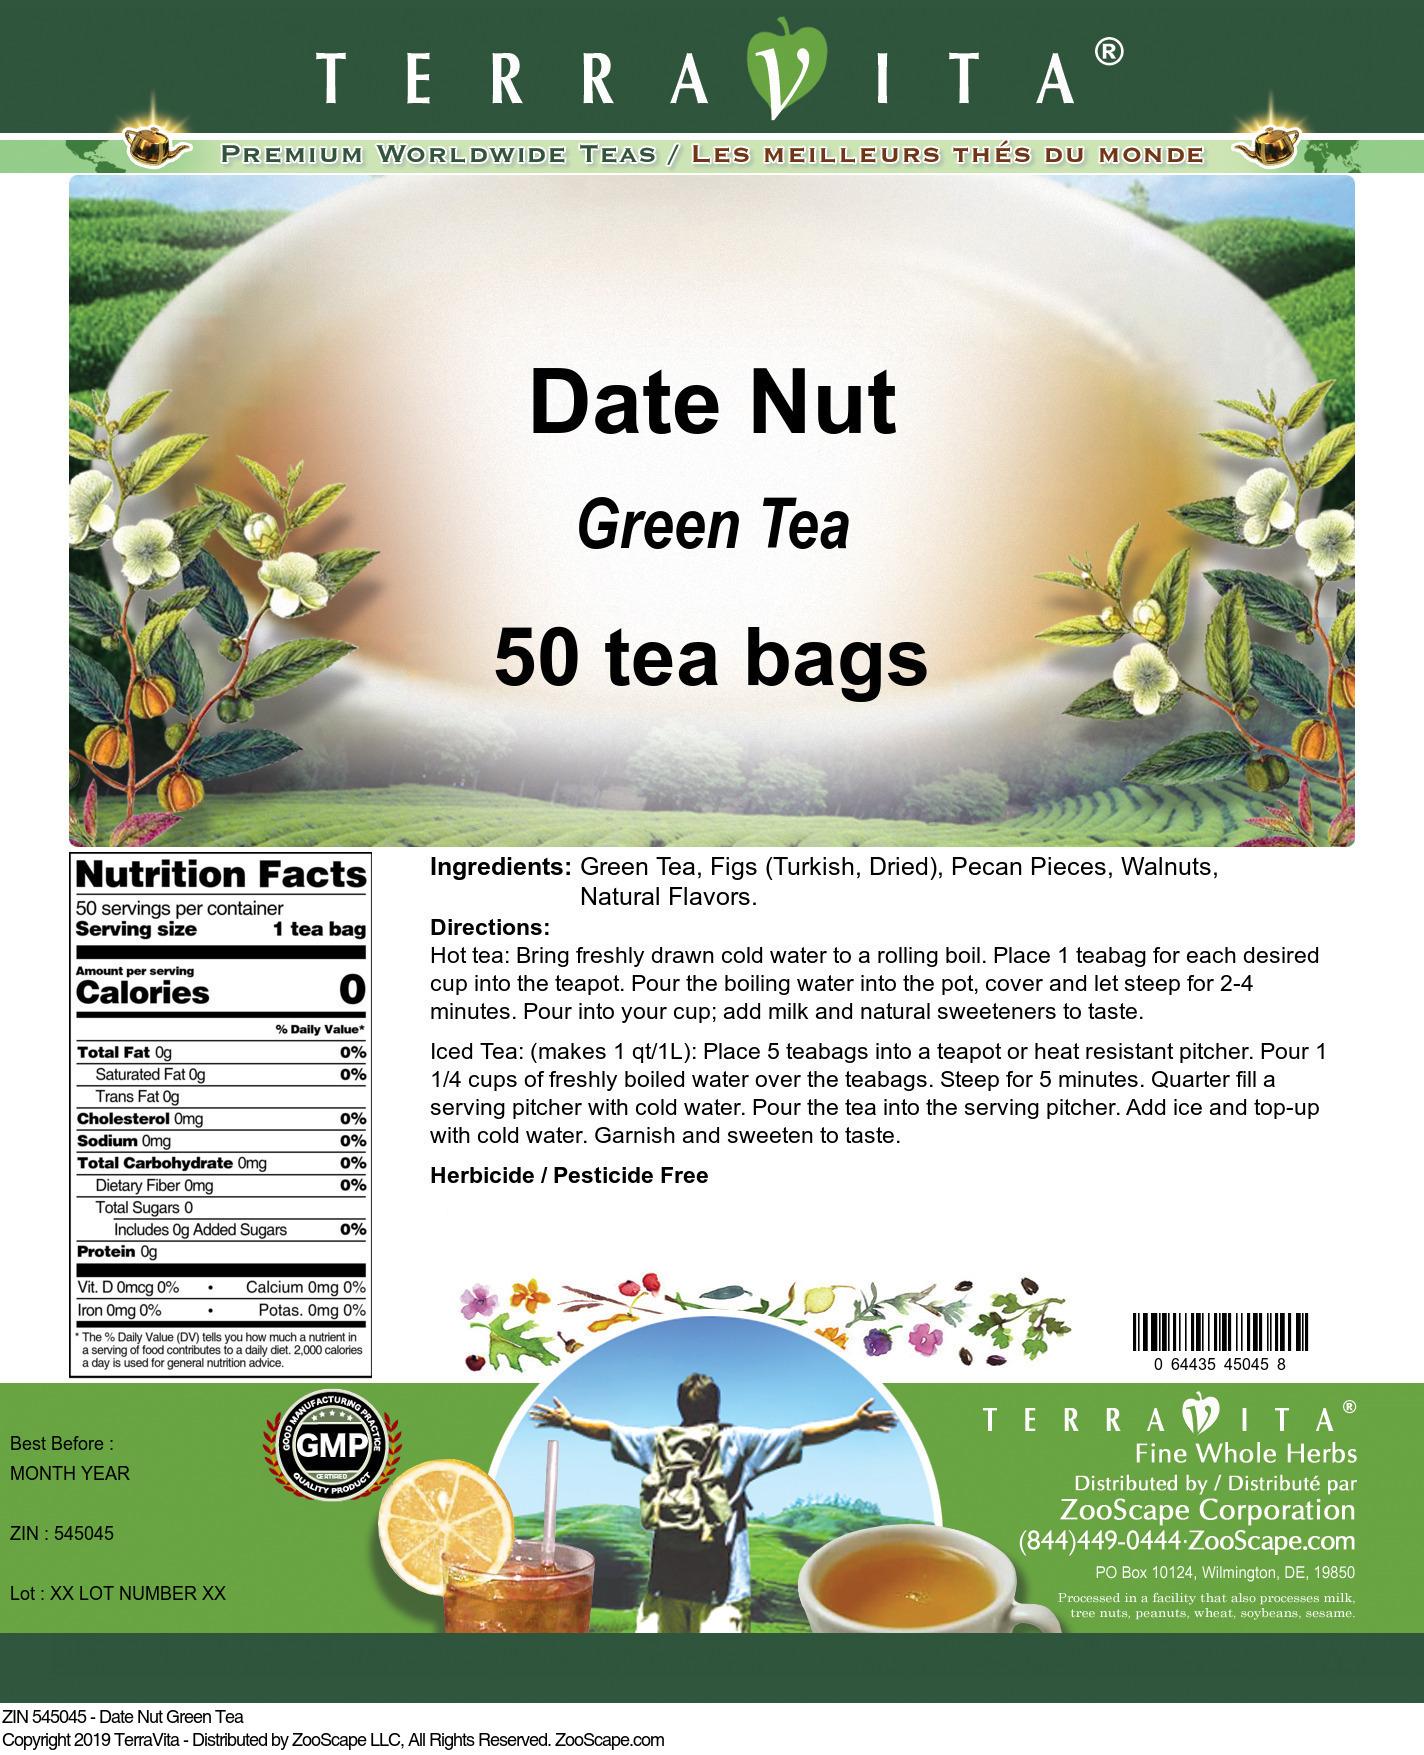 Date Nut Green Tea